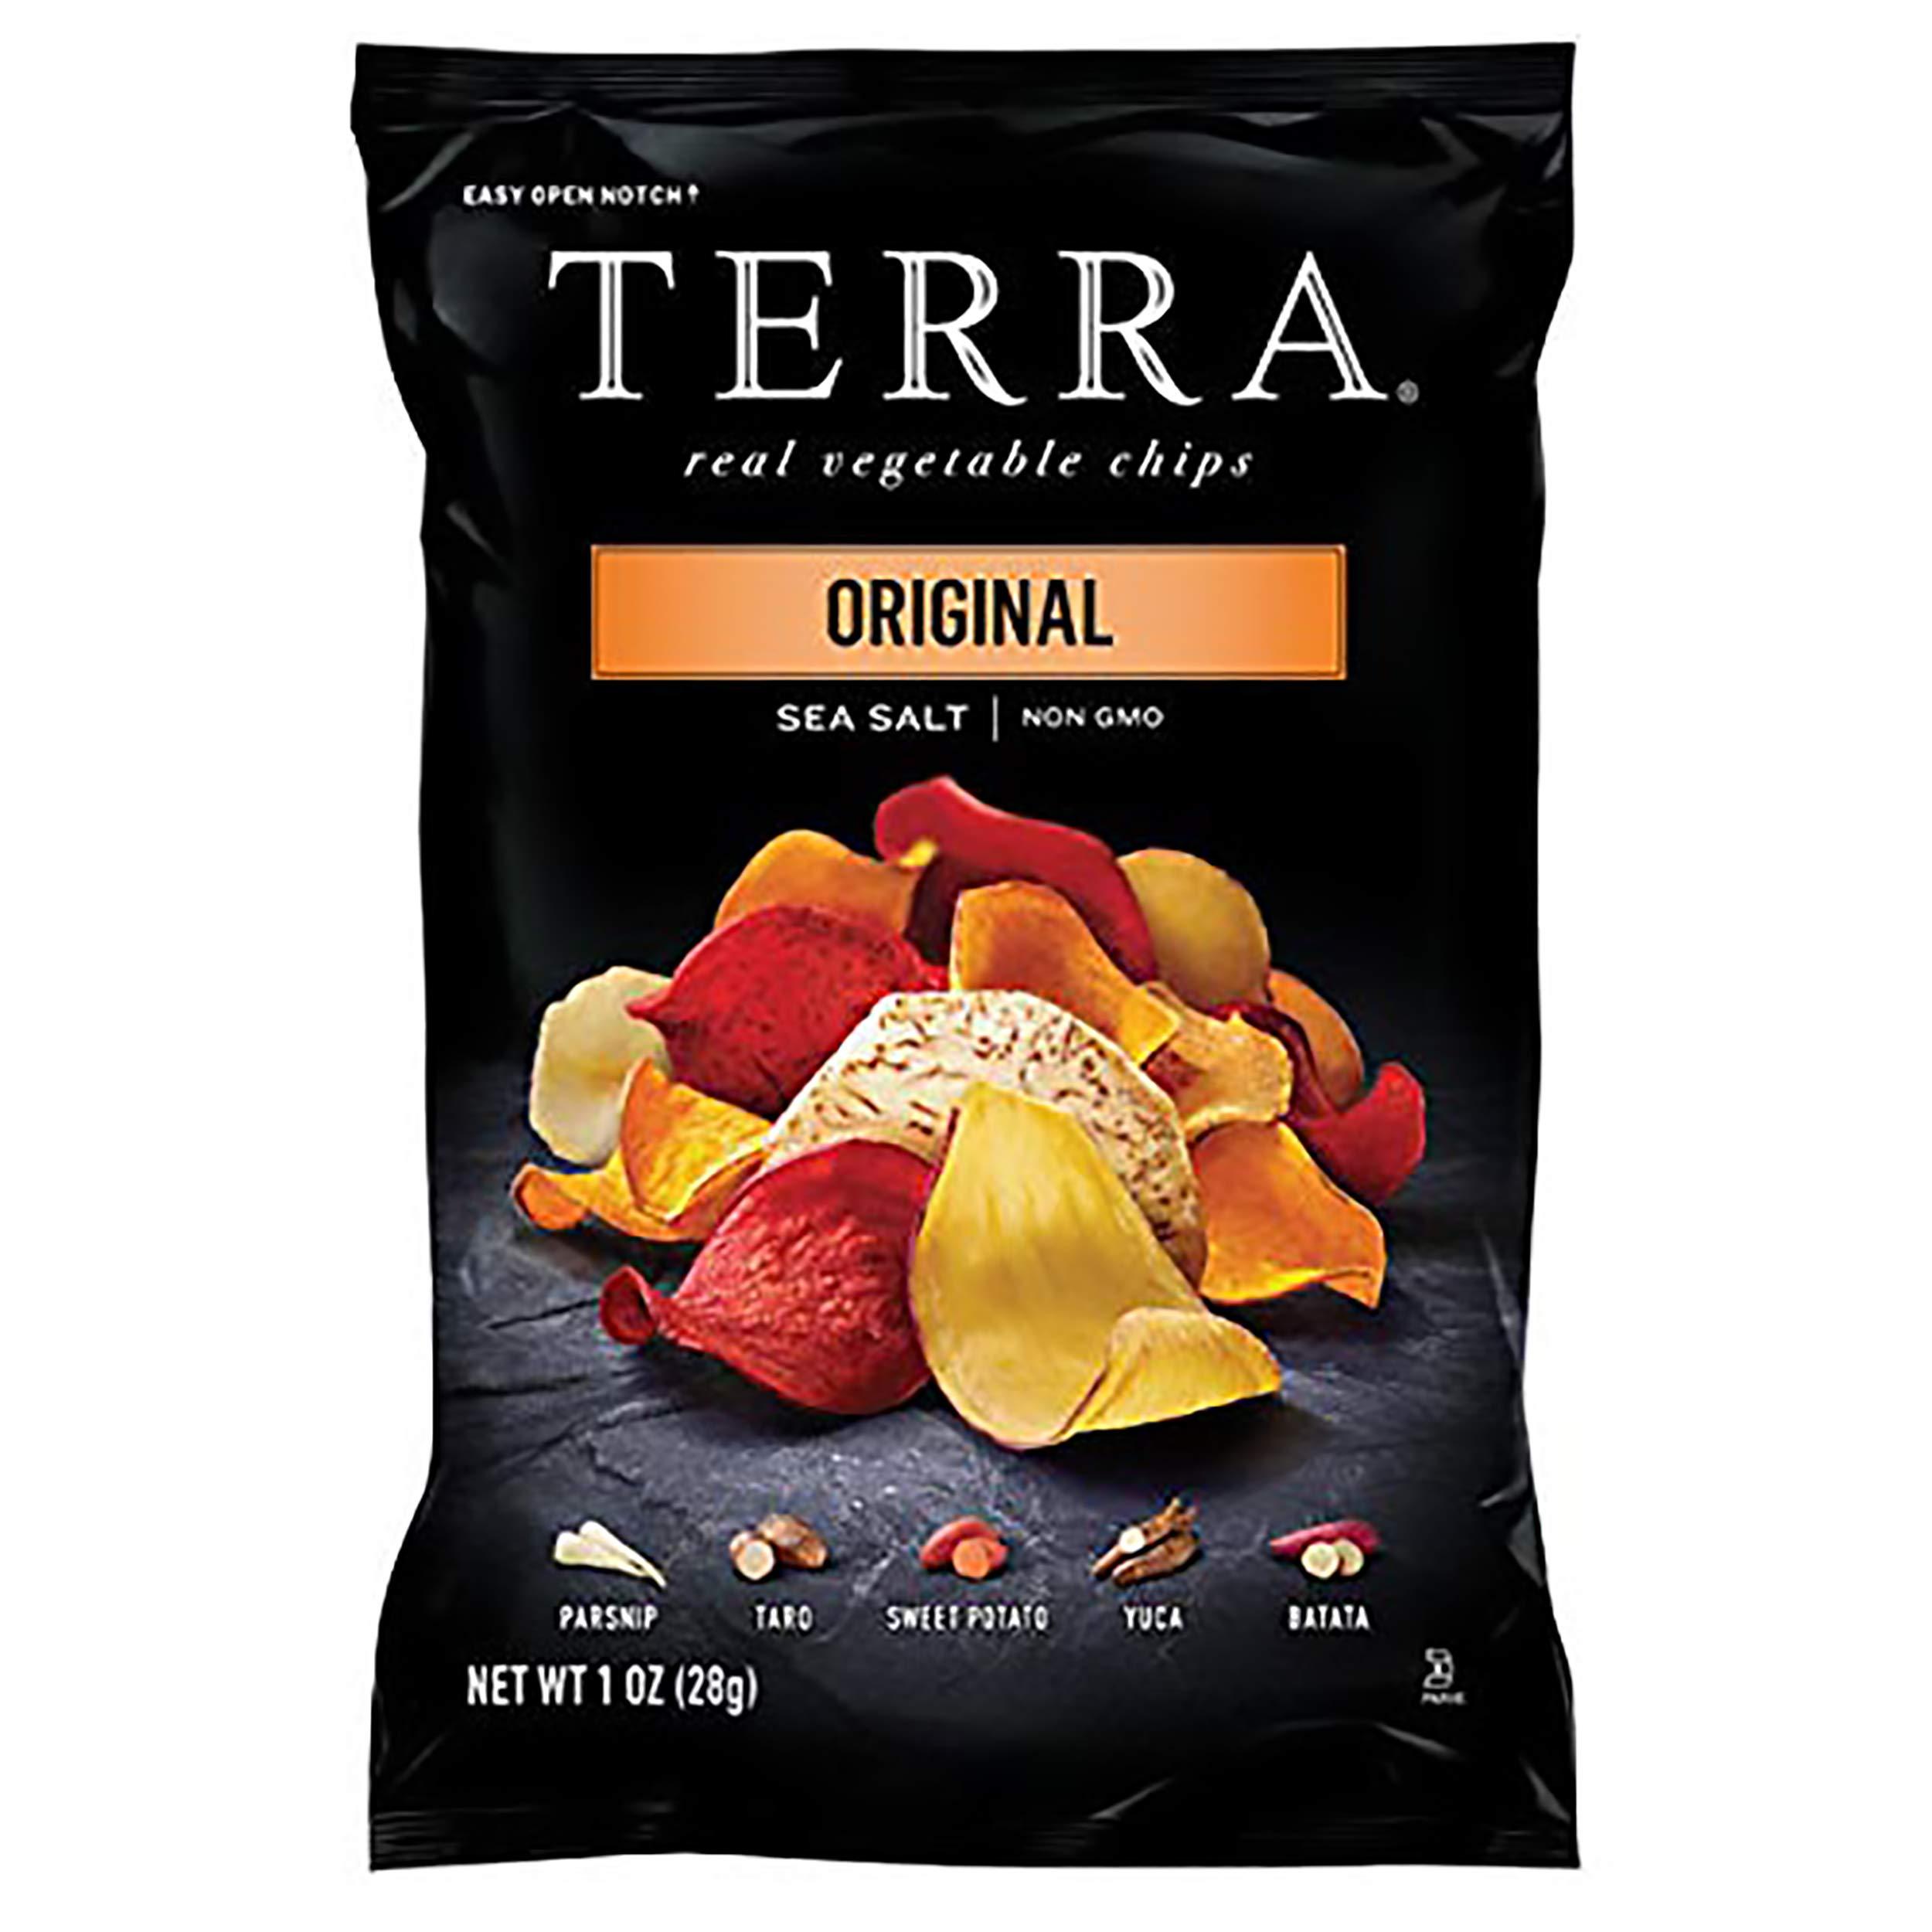 Terra Vegetable Chips with Sea Salt Pack , Black , Original, 24 Ounce